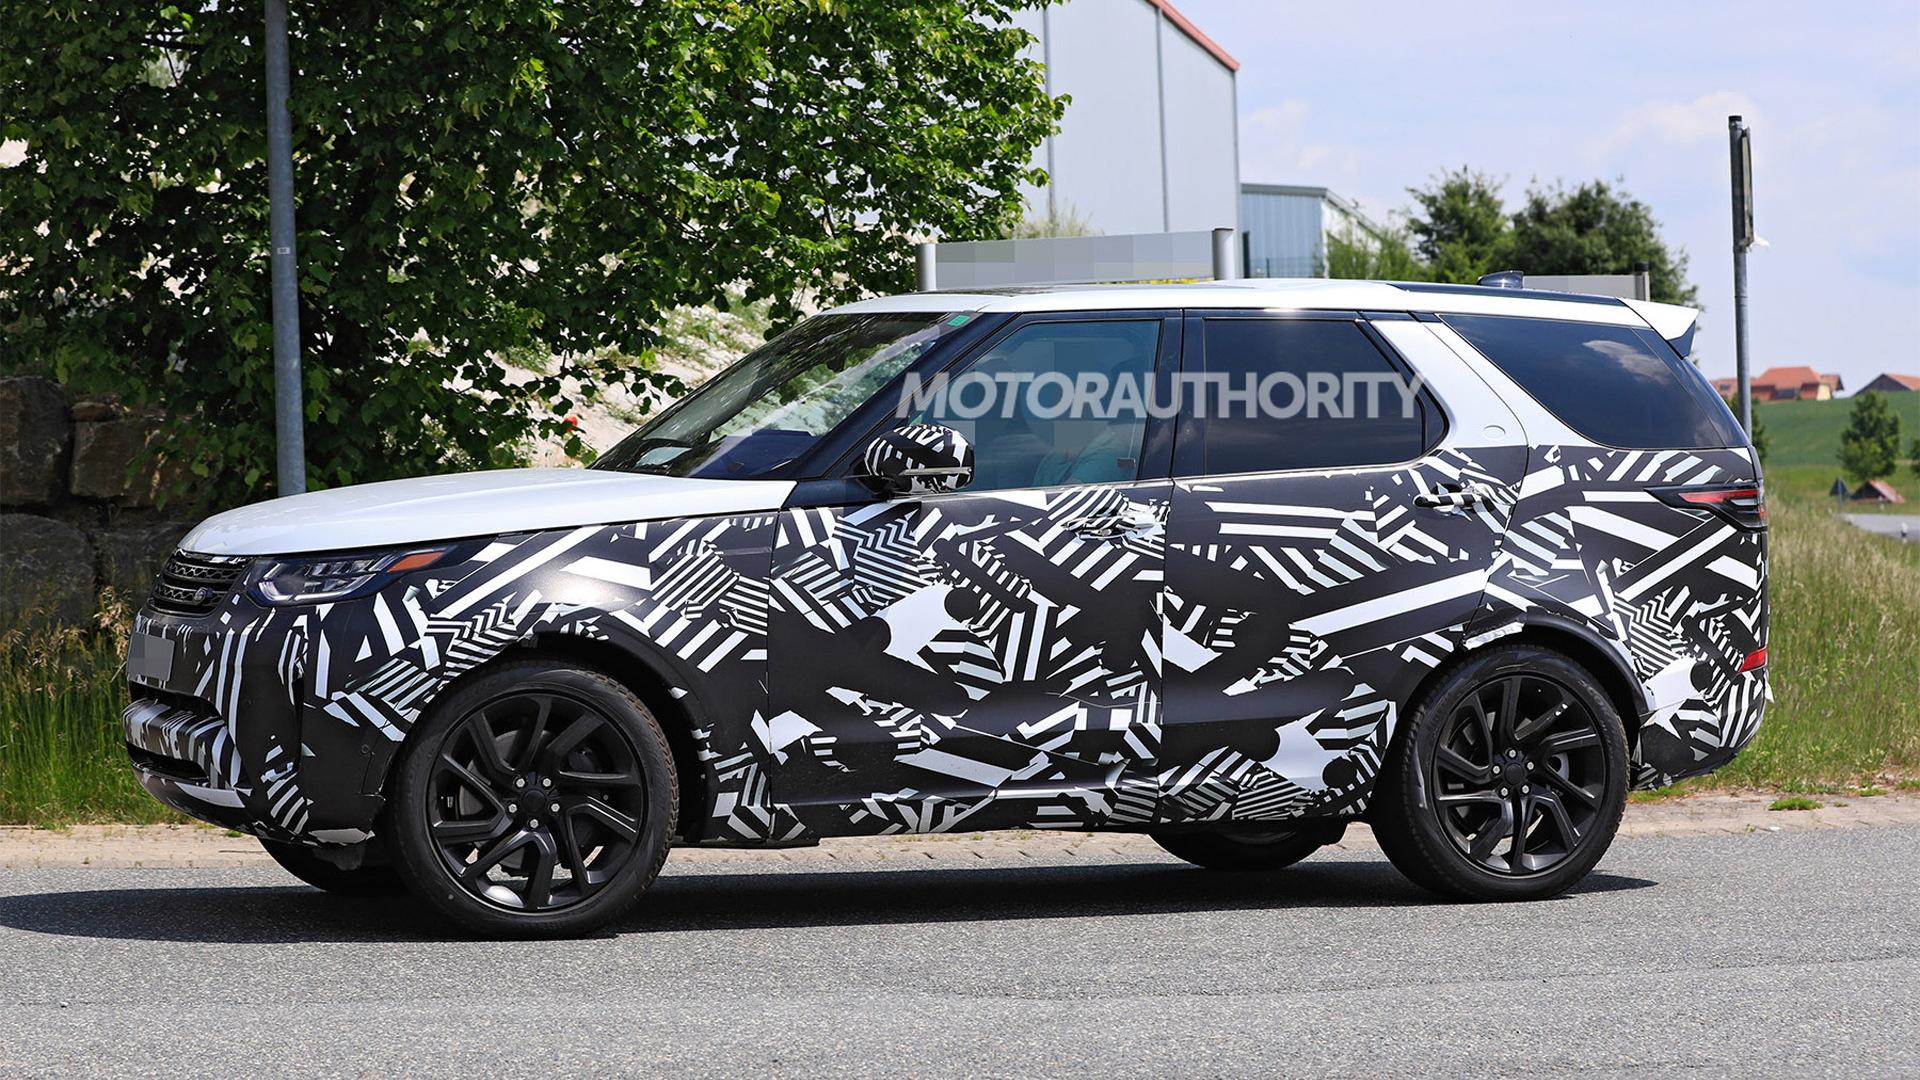 2021 Land Rover Discovery facelift spy shots - Photo credit:S. Baldauf/SB-Medien